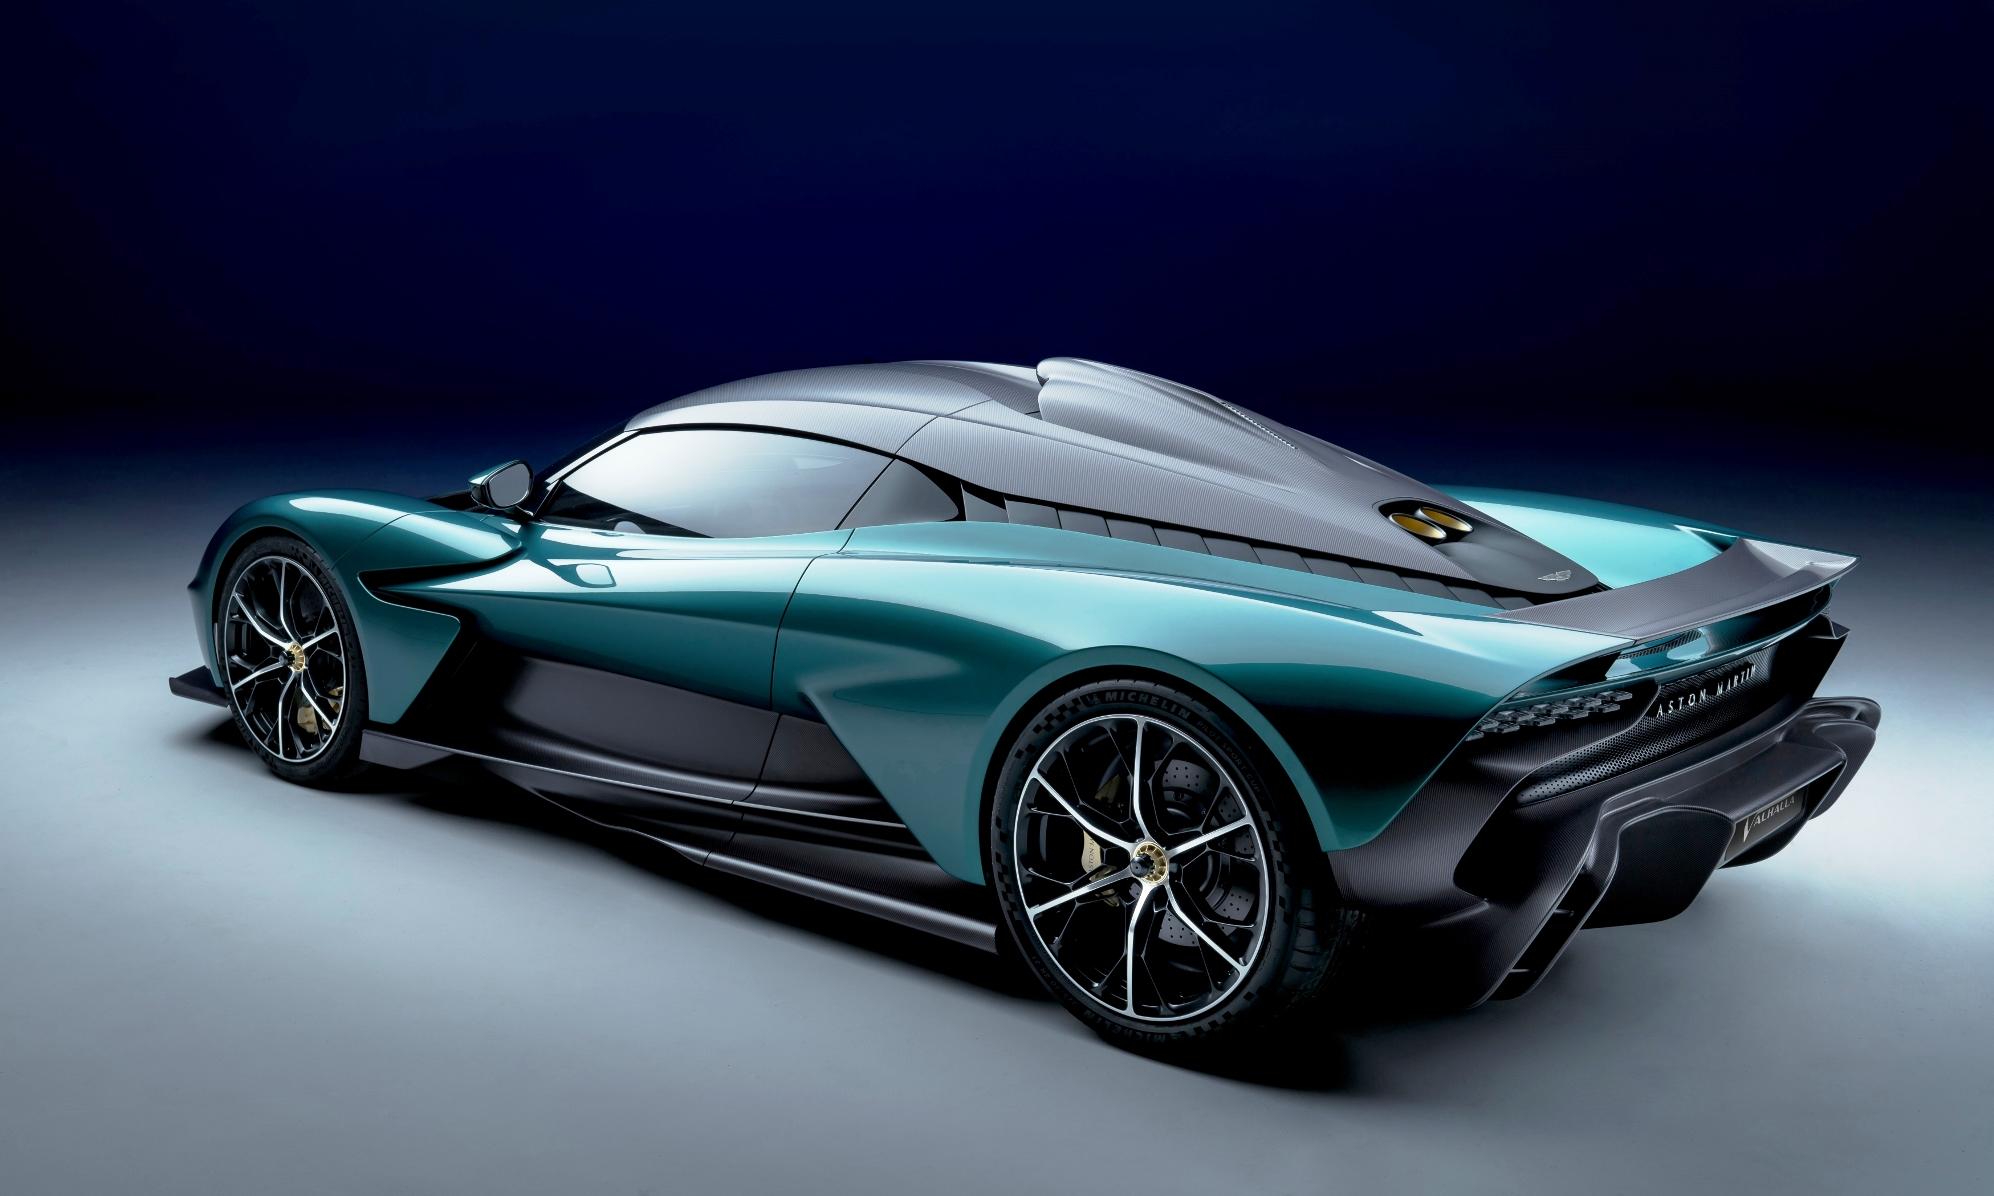 Aston Martin Valhalla side rear